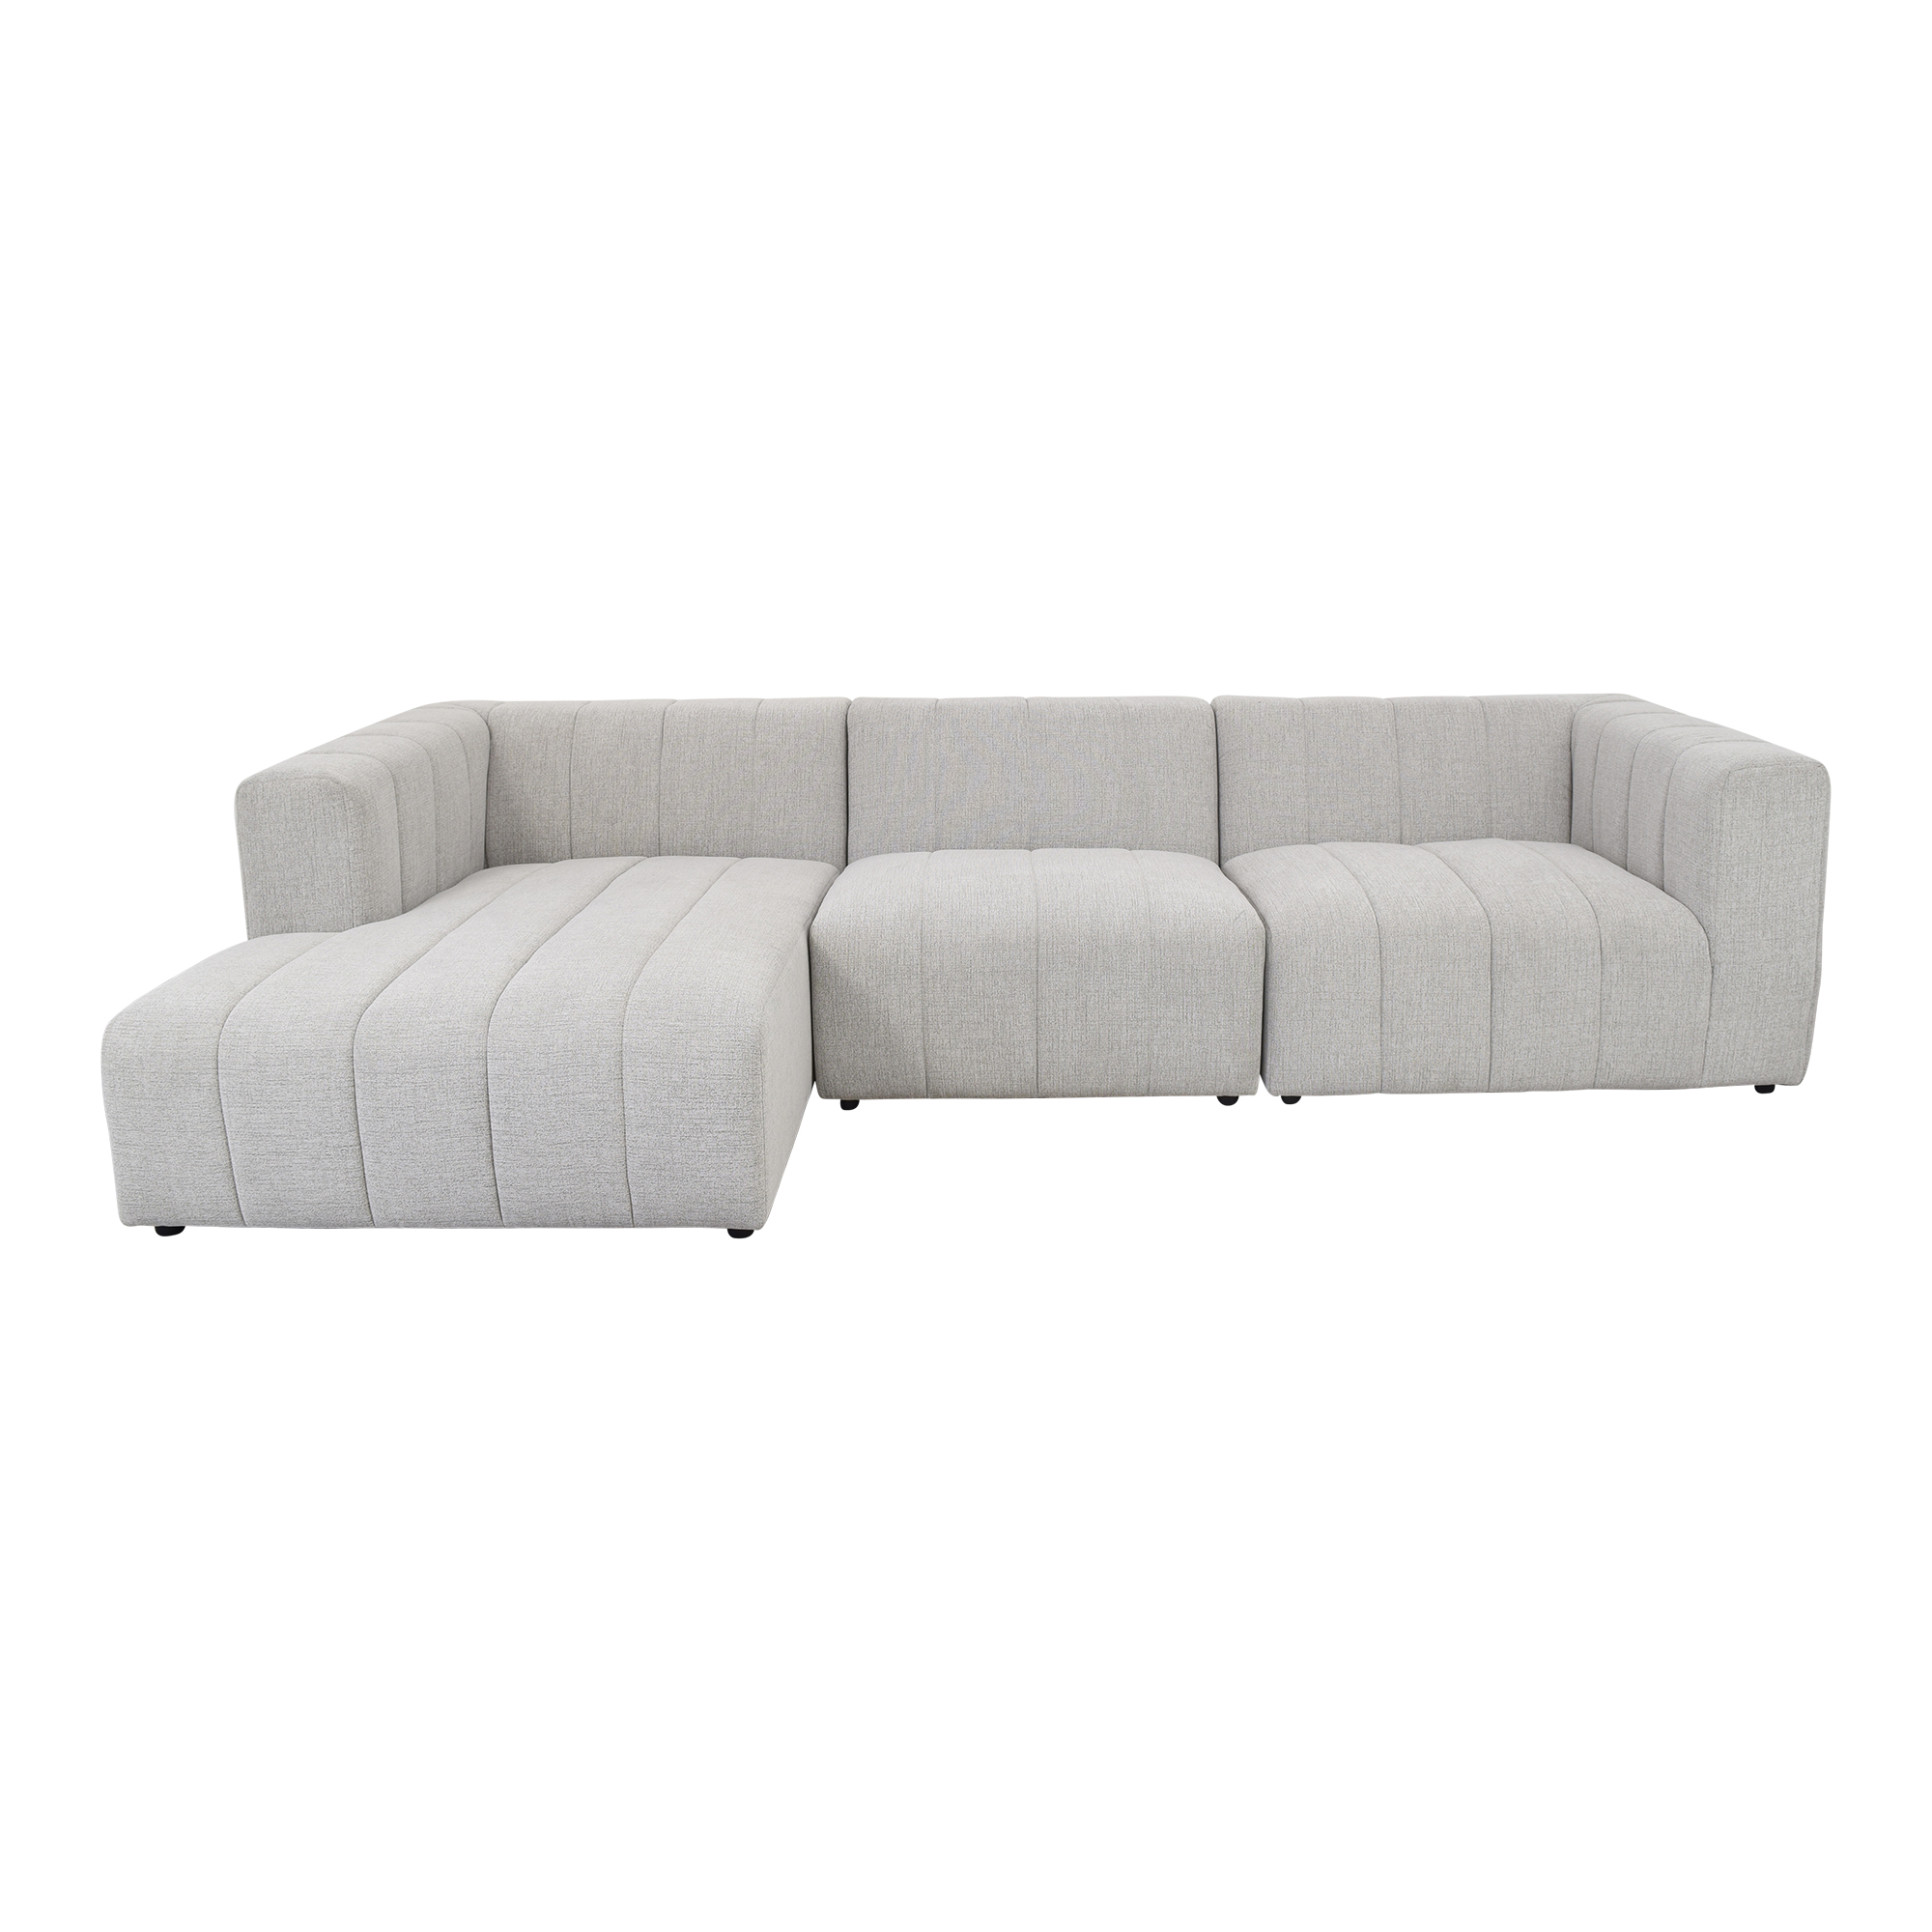 Four Hands Langham Modular Sofa sale